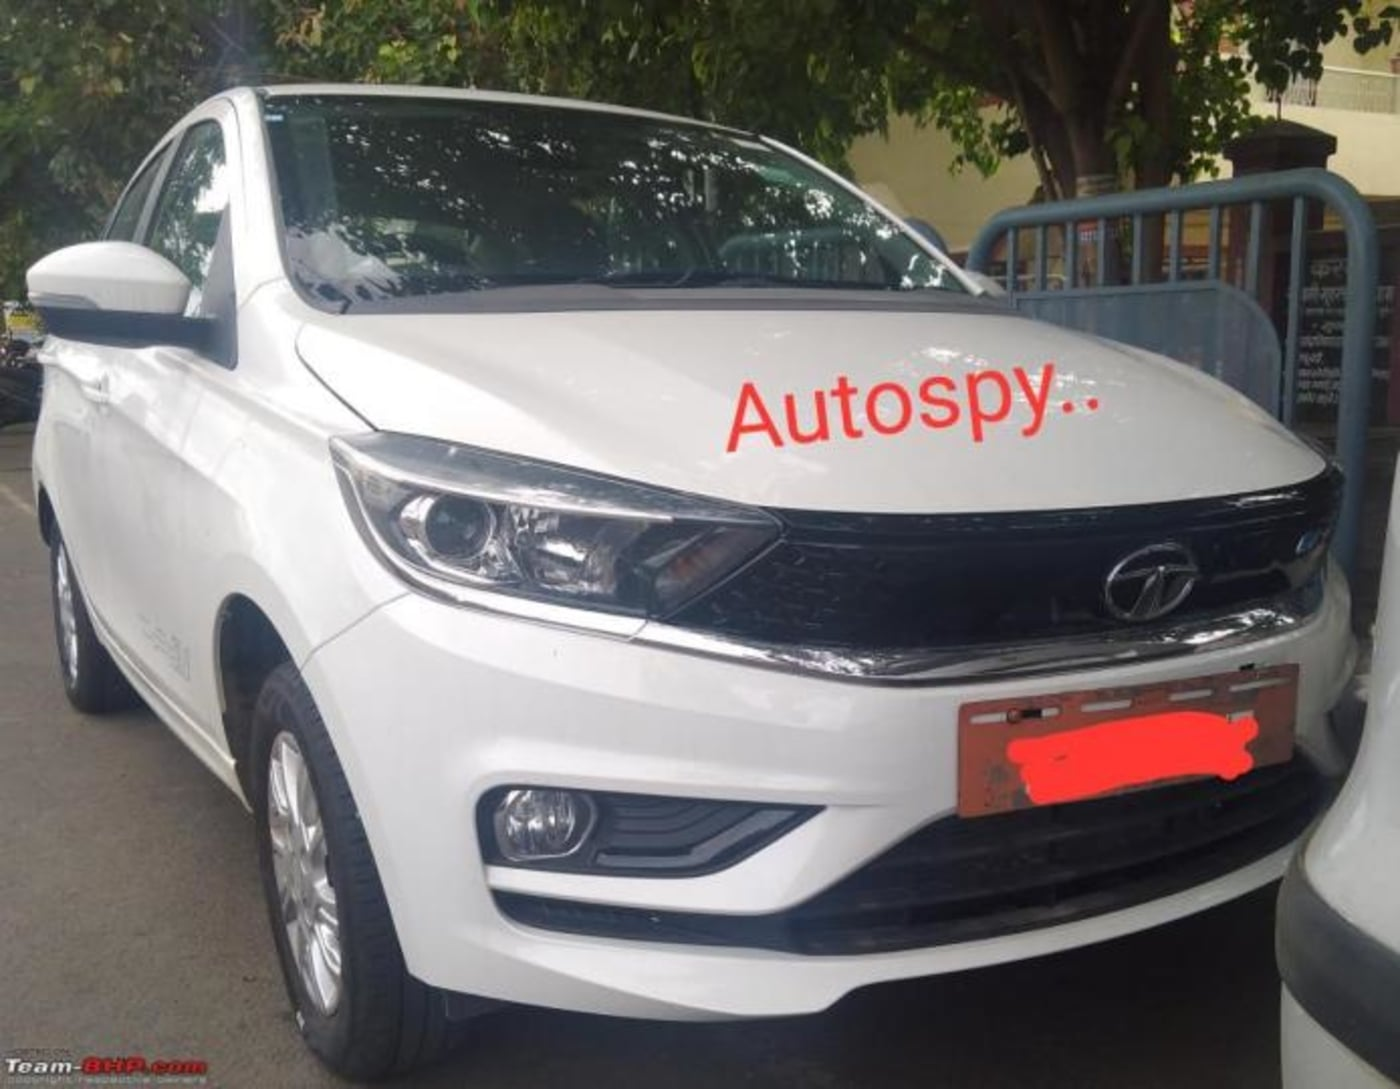 Tata Tigor EV Facelift Spied On Test Without Camouflage